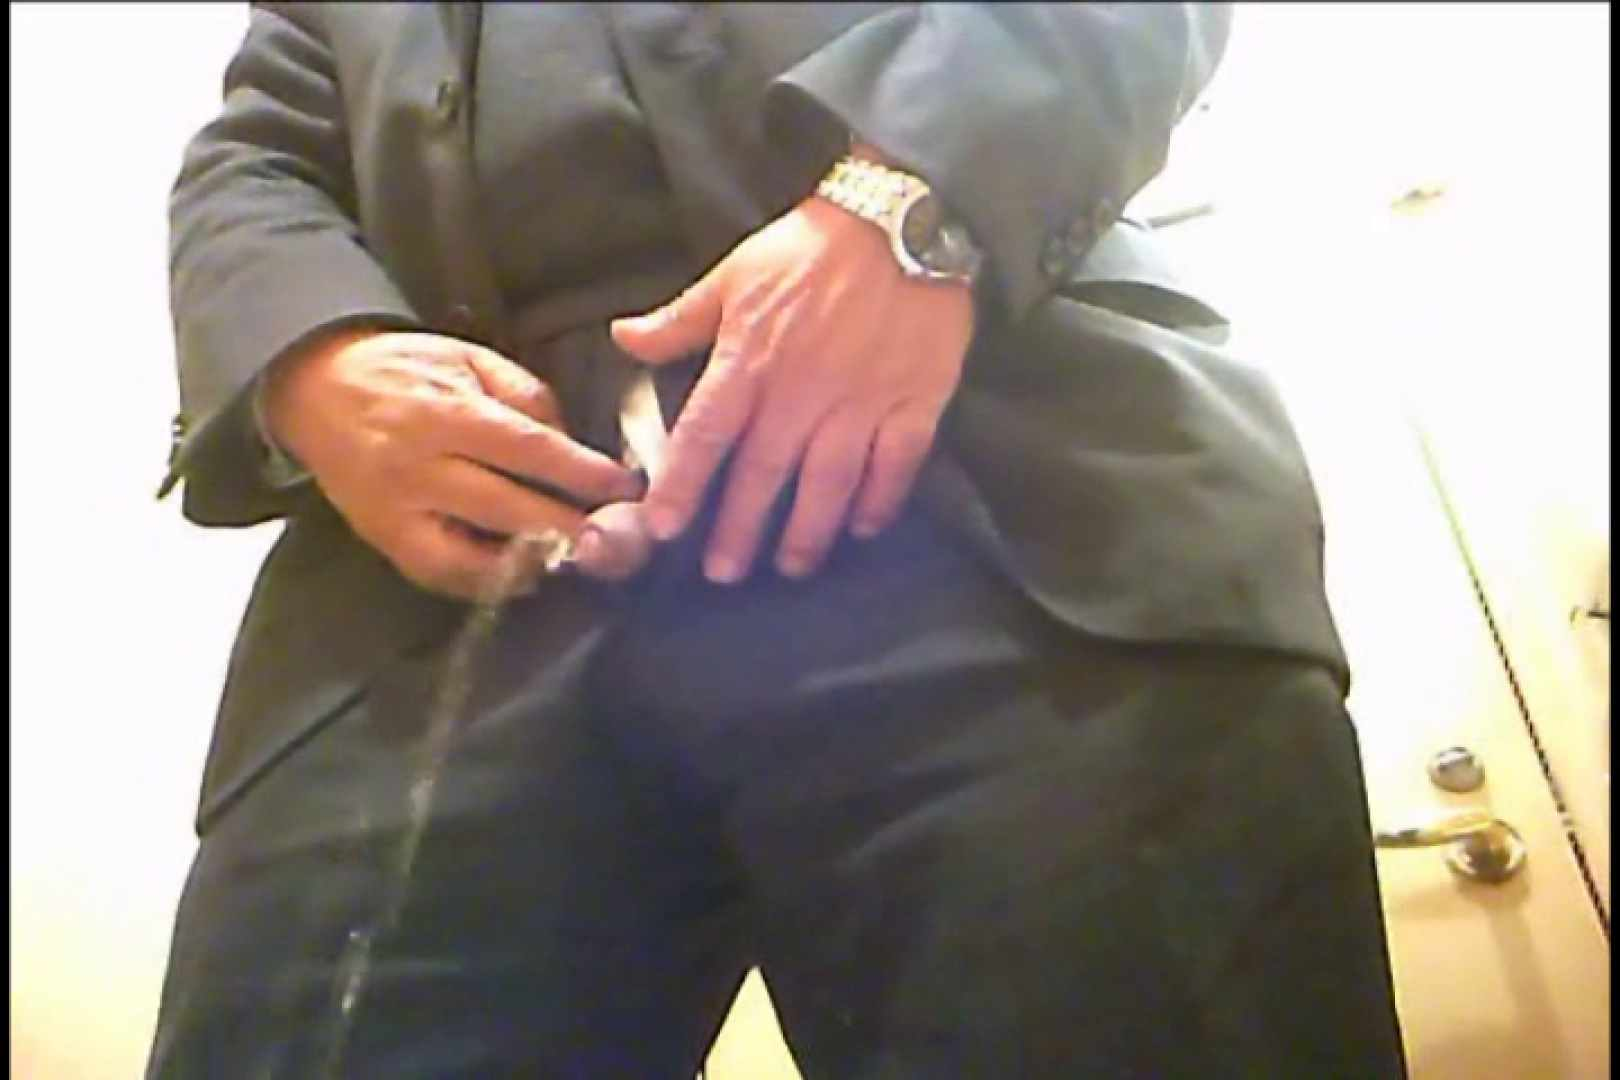 Gボーイ初投稿!掴み取りさんの洗面所覗き!in新幹線!VOL.05 スーツ ゲイモロ見え画像 63連発 15